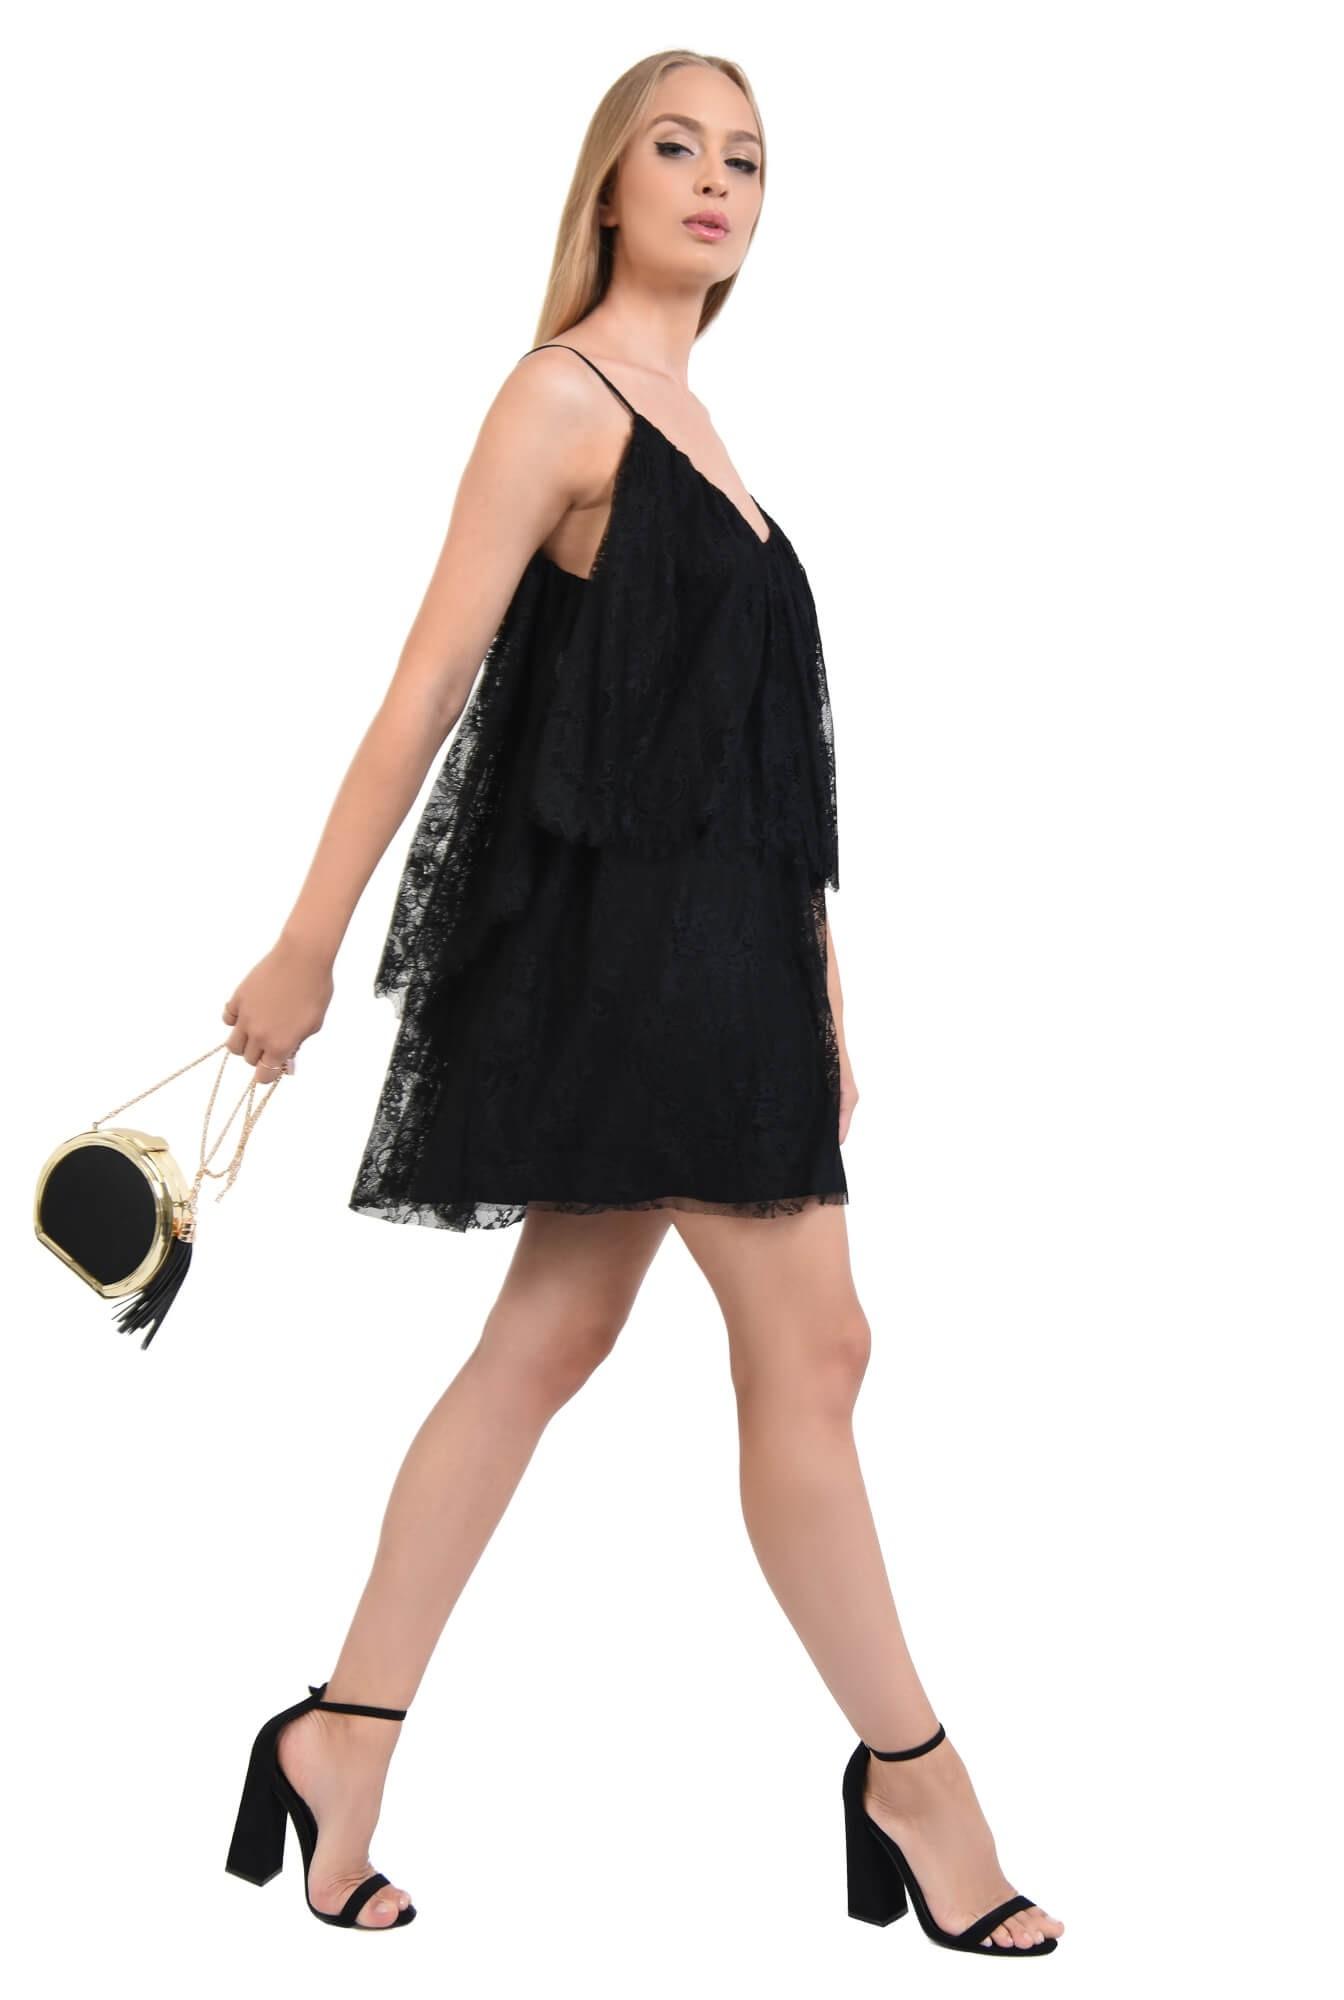 rochie de seara, scurta, din dantela, negru, bretele subtiri